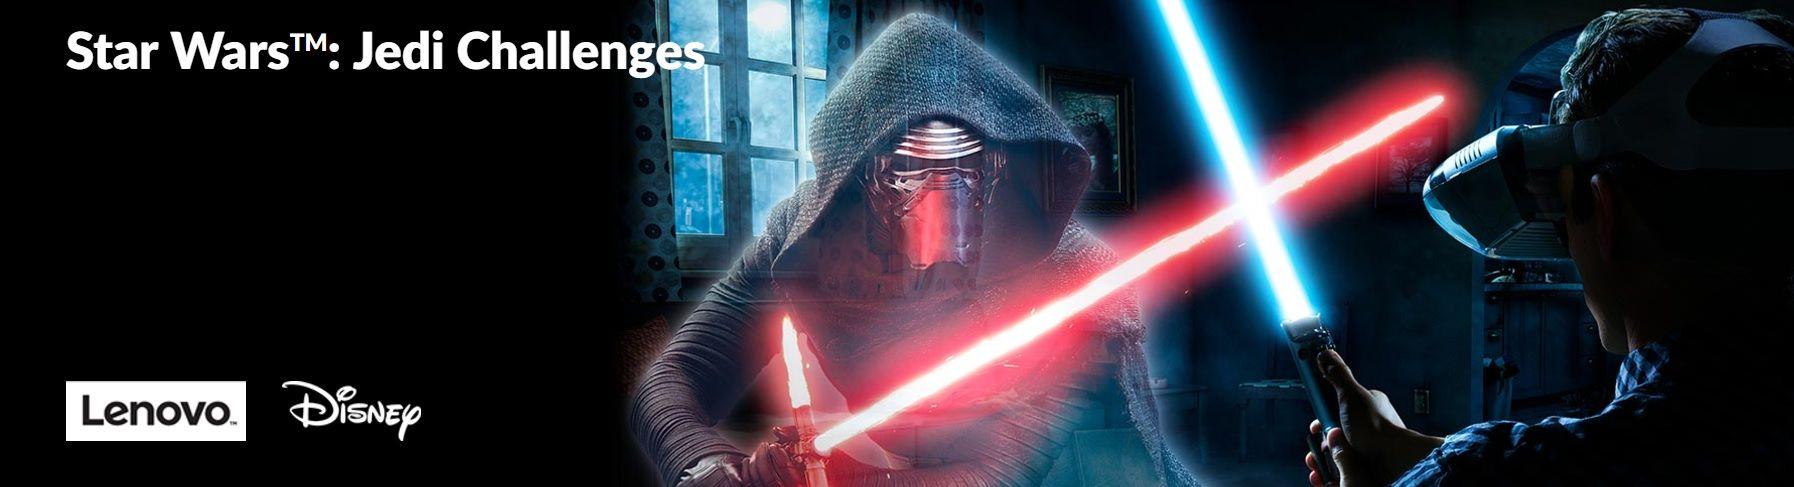 Lenovo Jedi challenges se actualiza para pasarte al lado oscuro con Kylo Ren